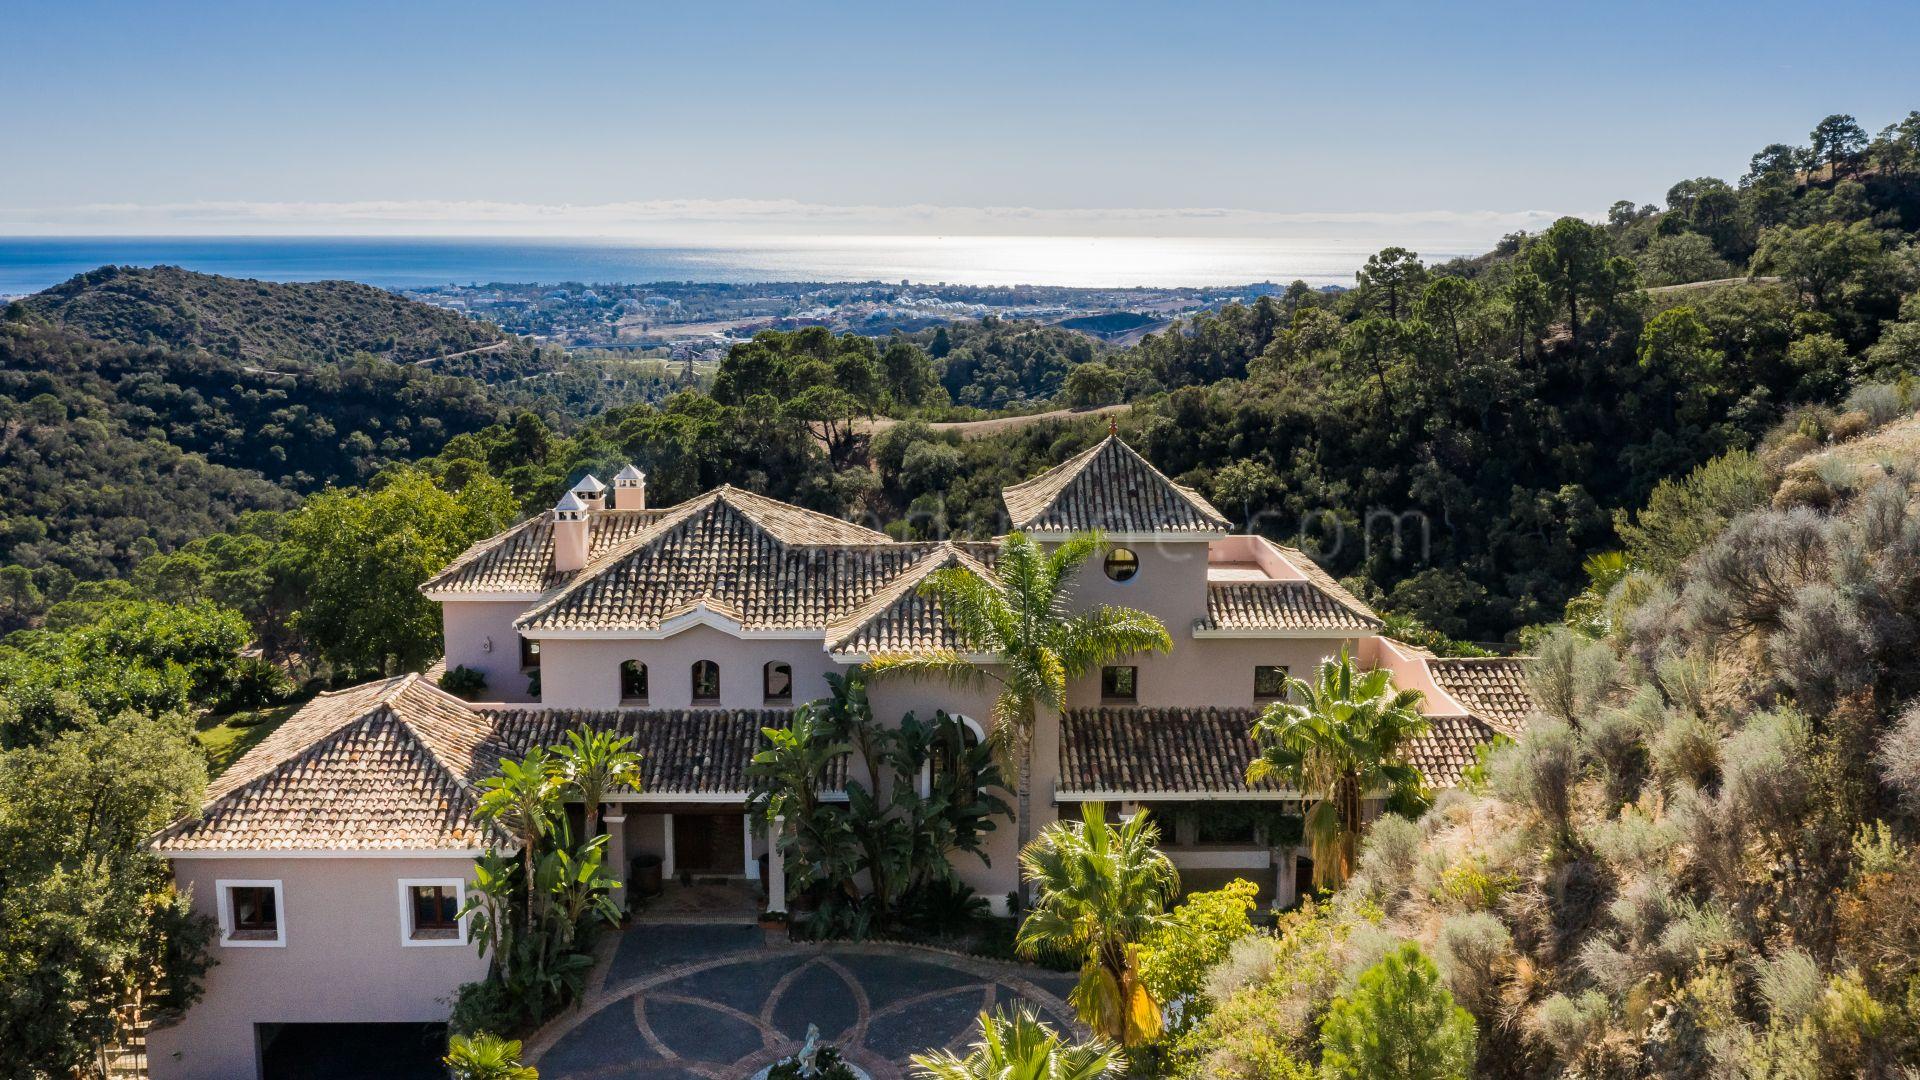 La Zagaleta Villa With Panoramic Sea And Mountain Views